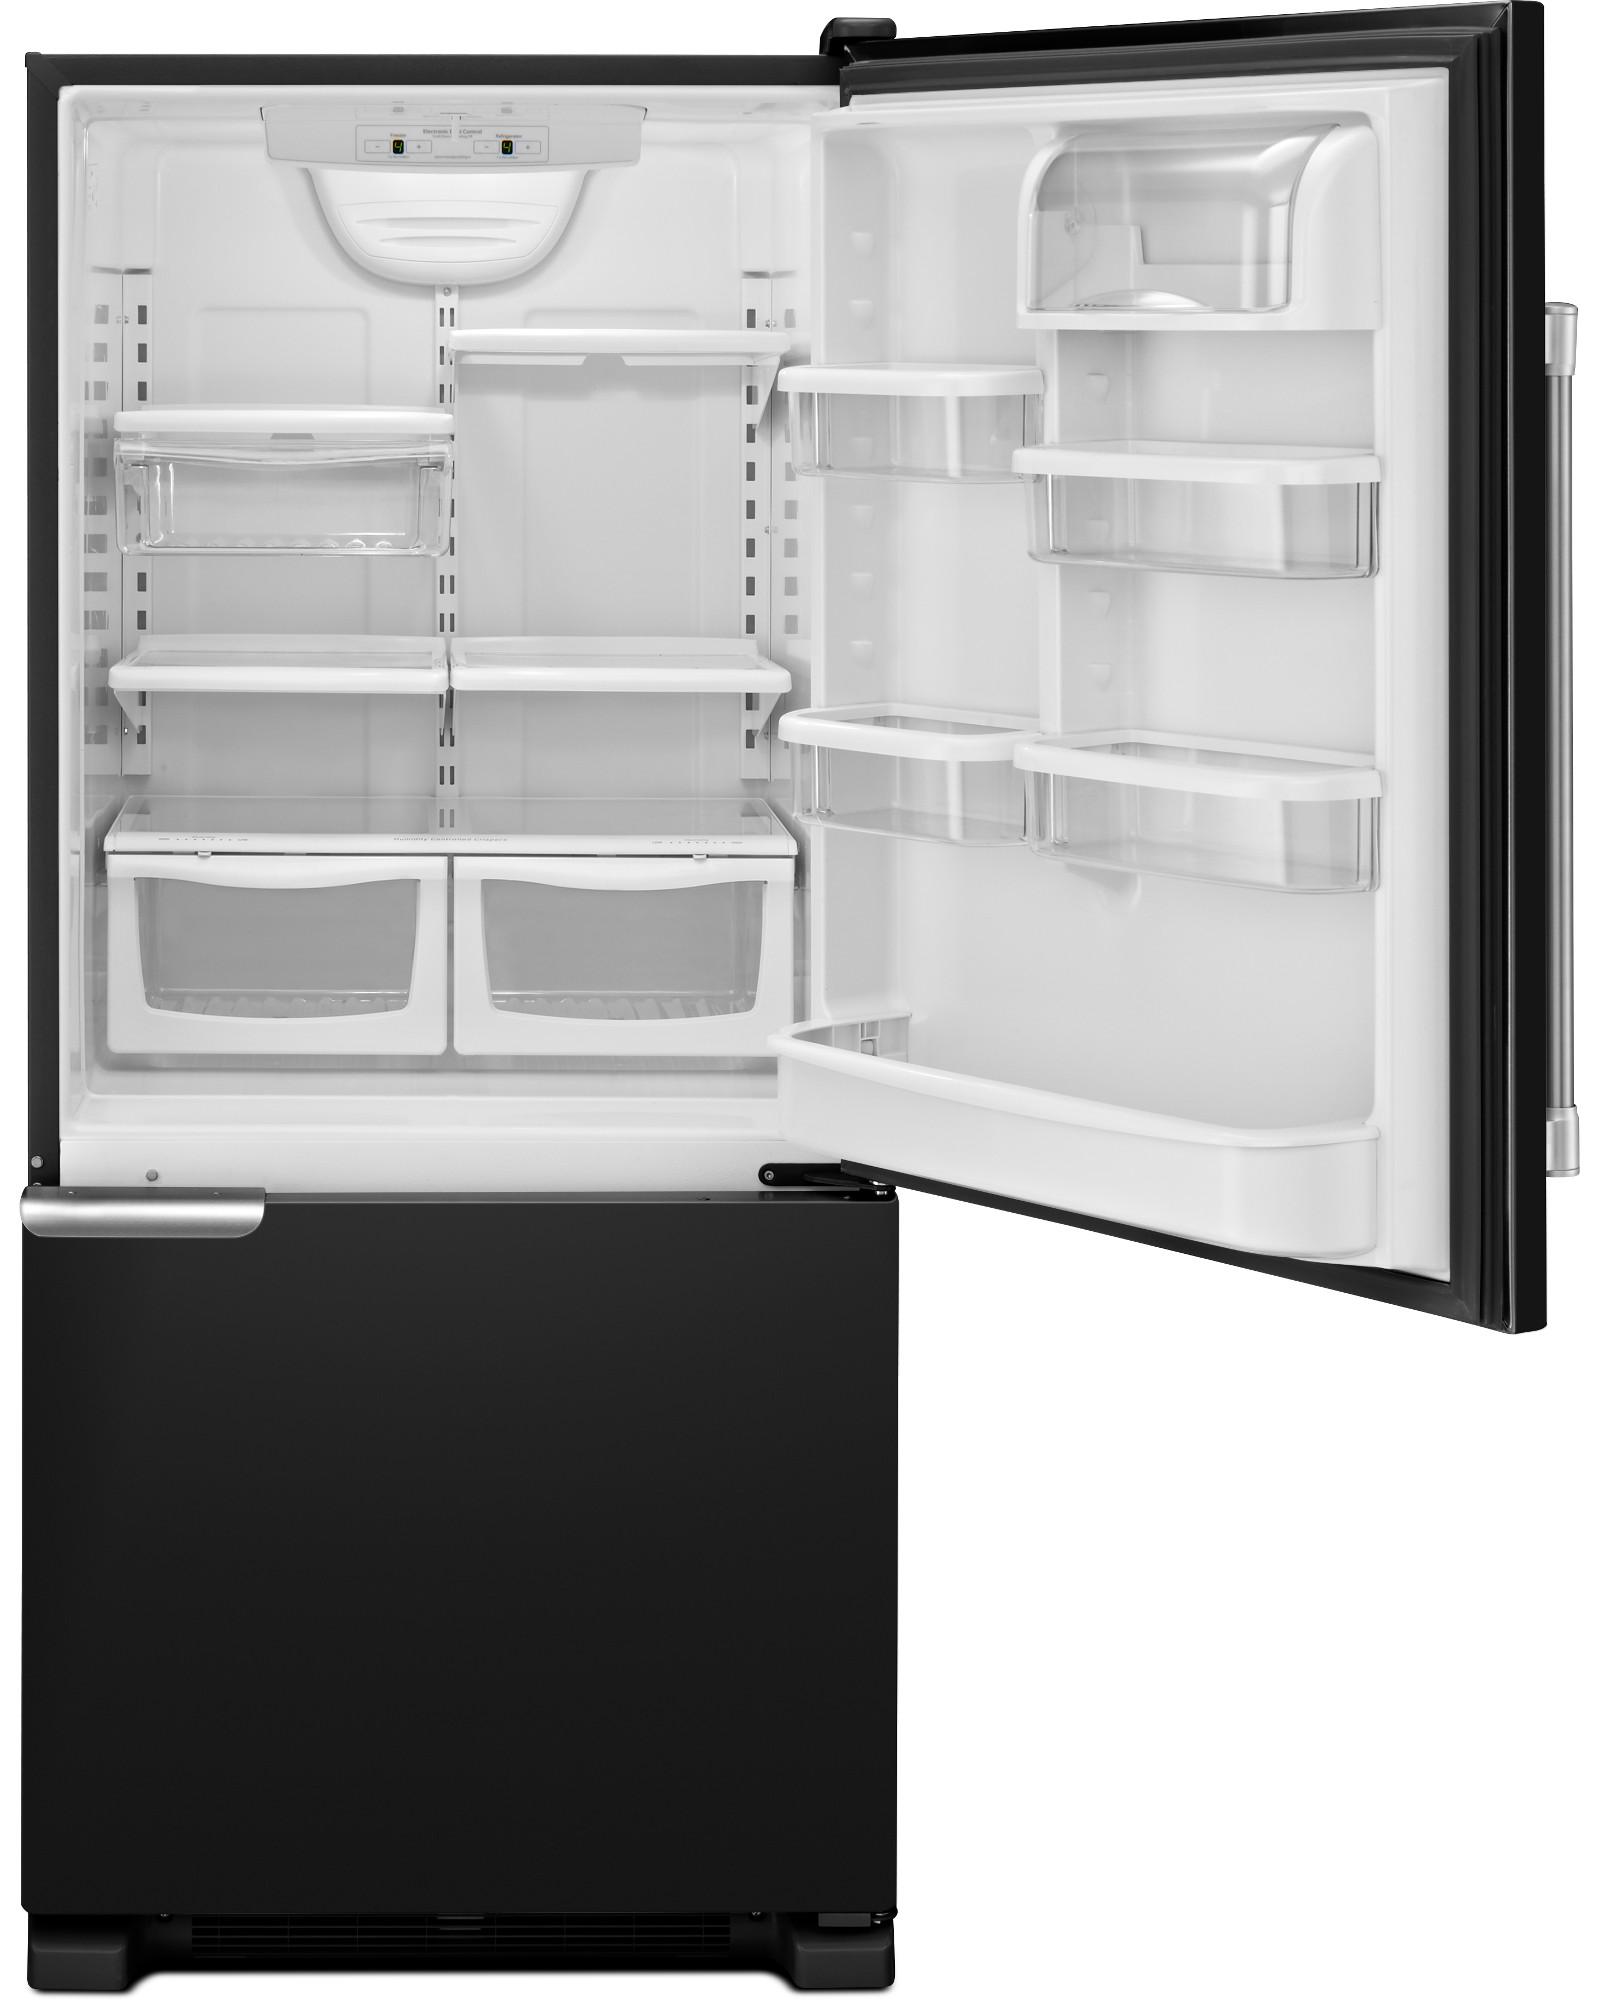 Maytag MBF1953DEE 19 cu. ft. Single Door Bottom Freezer Refrigerator - Black